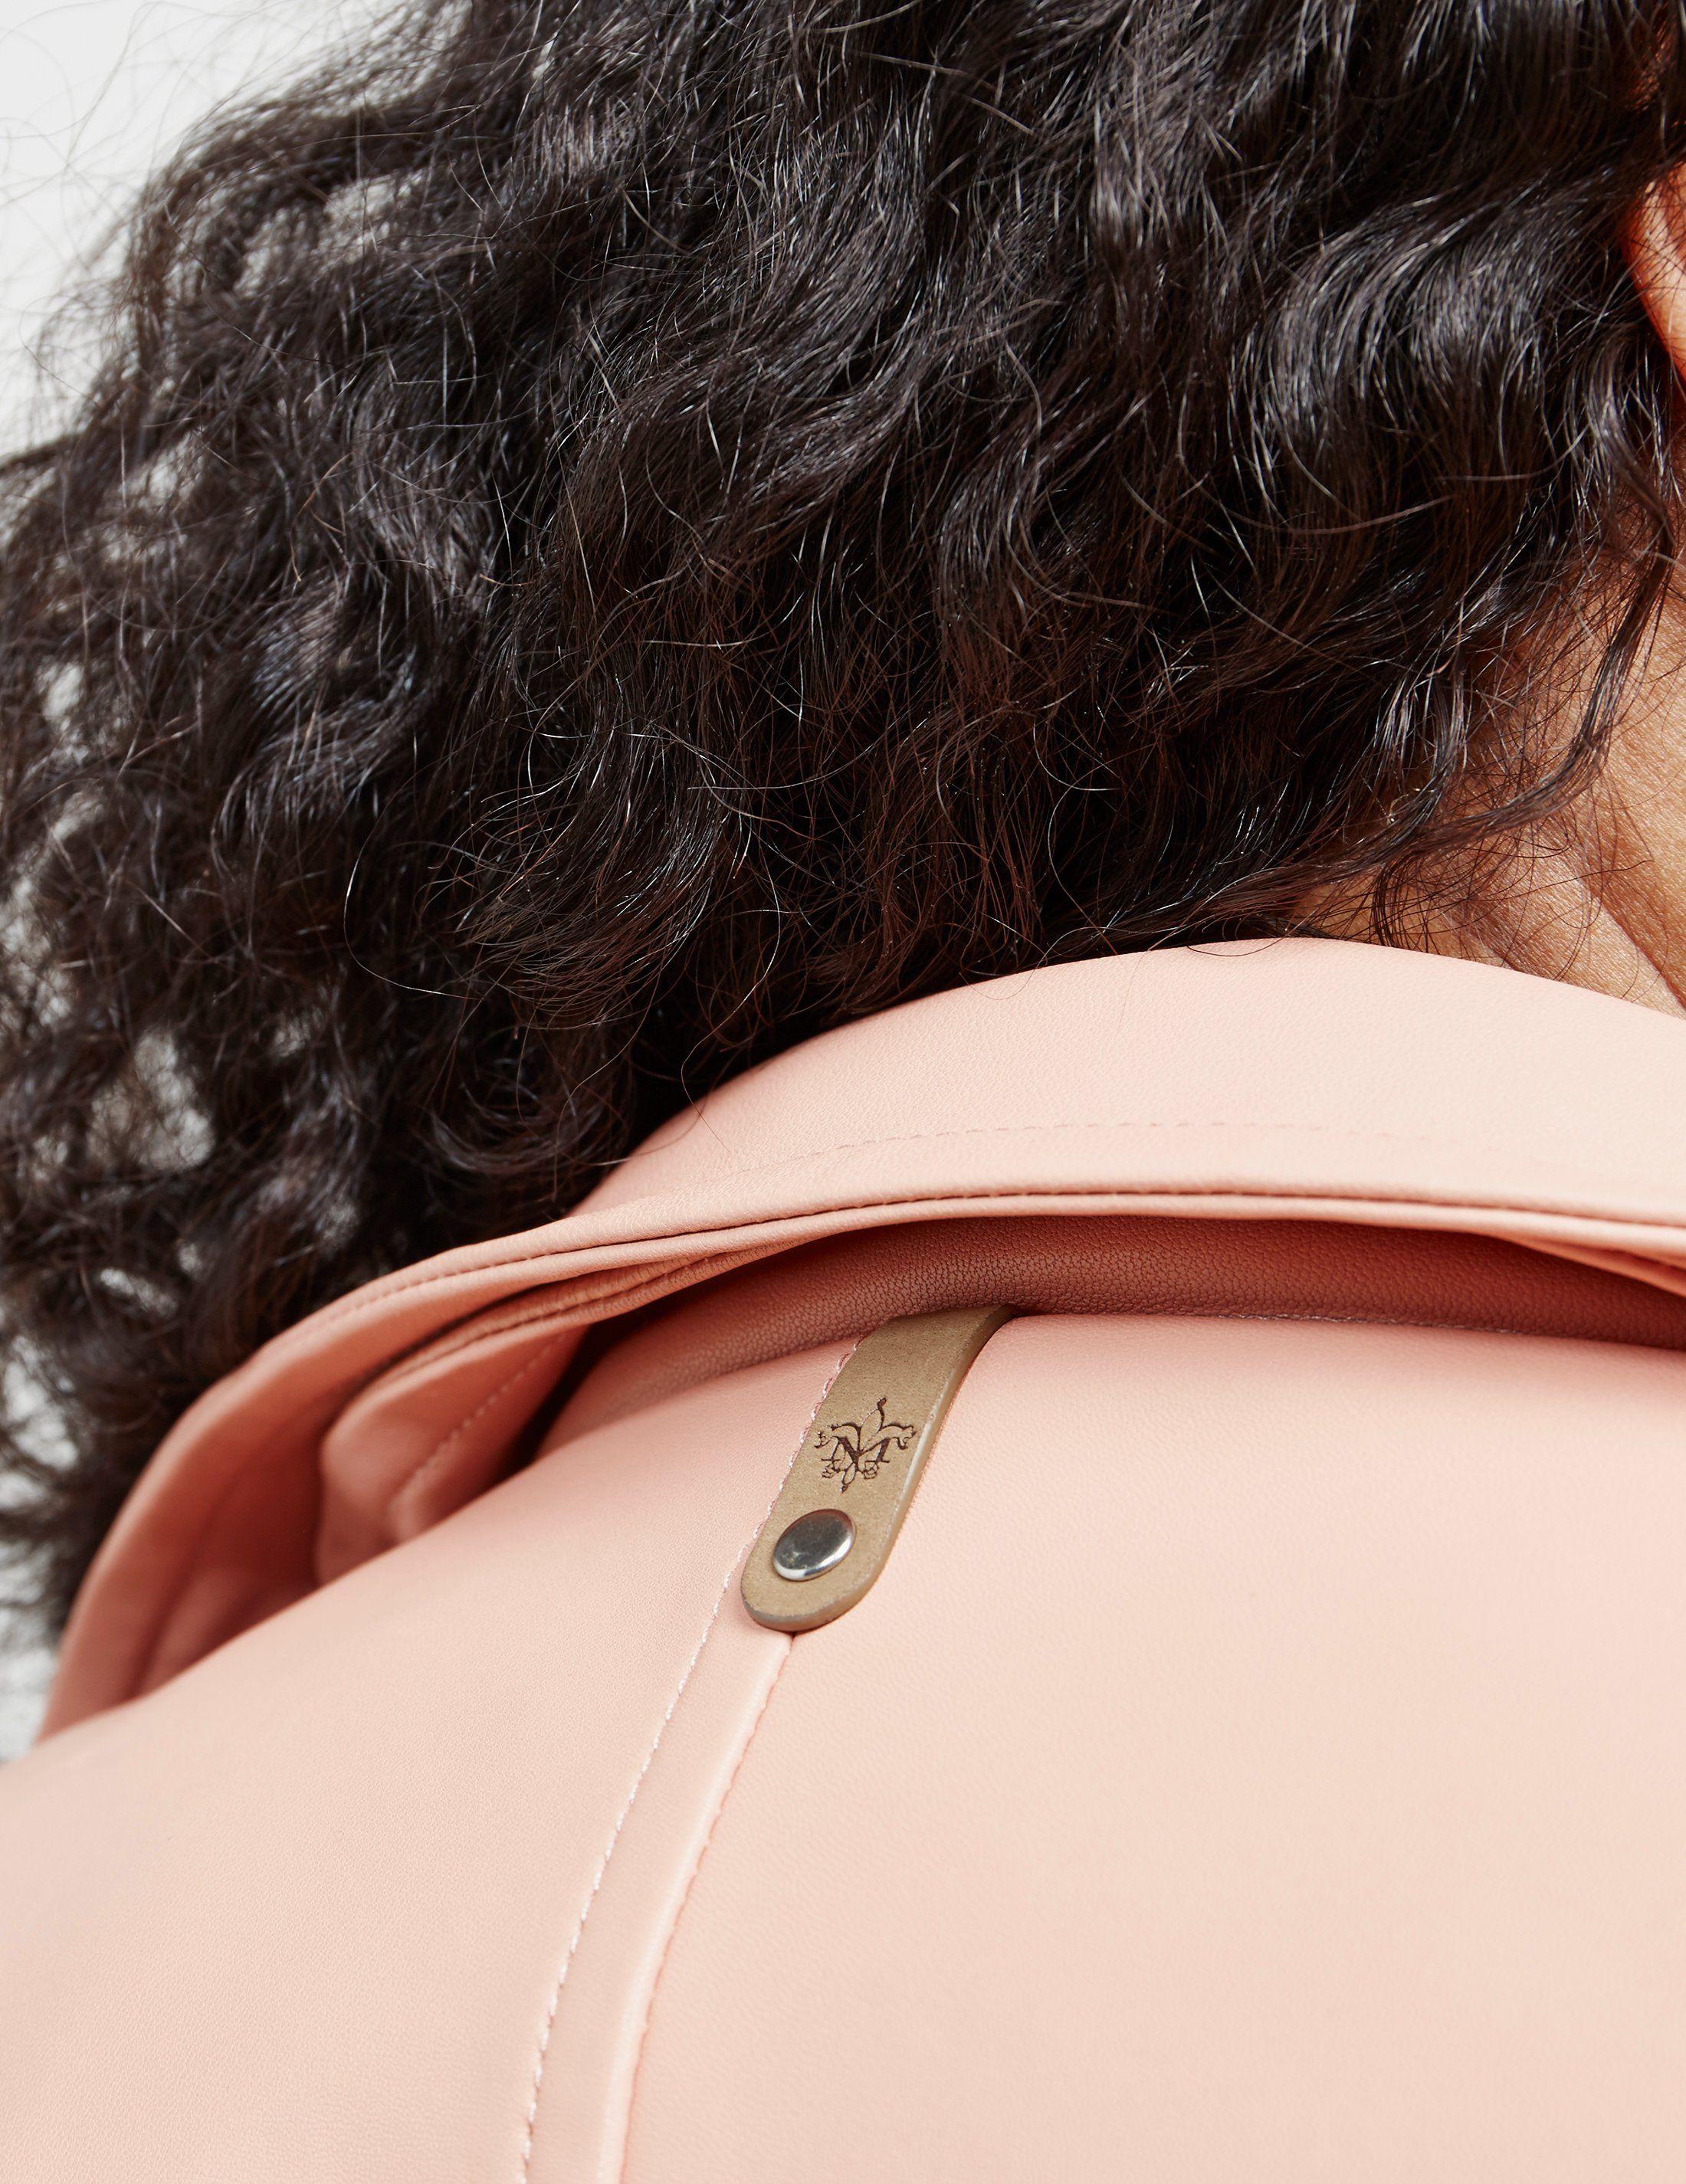 Mackage Leather Jacket - Online Exclusive